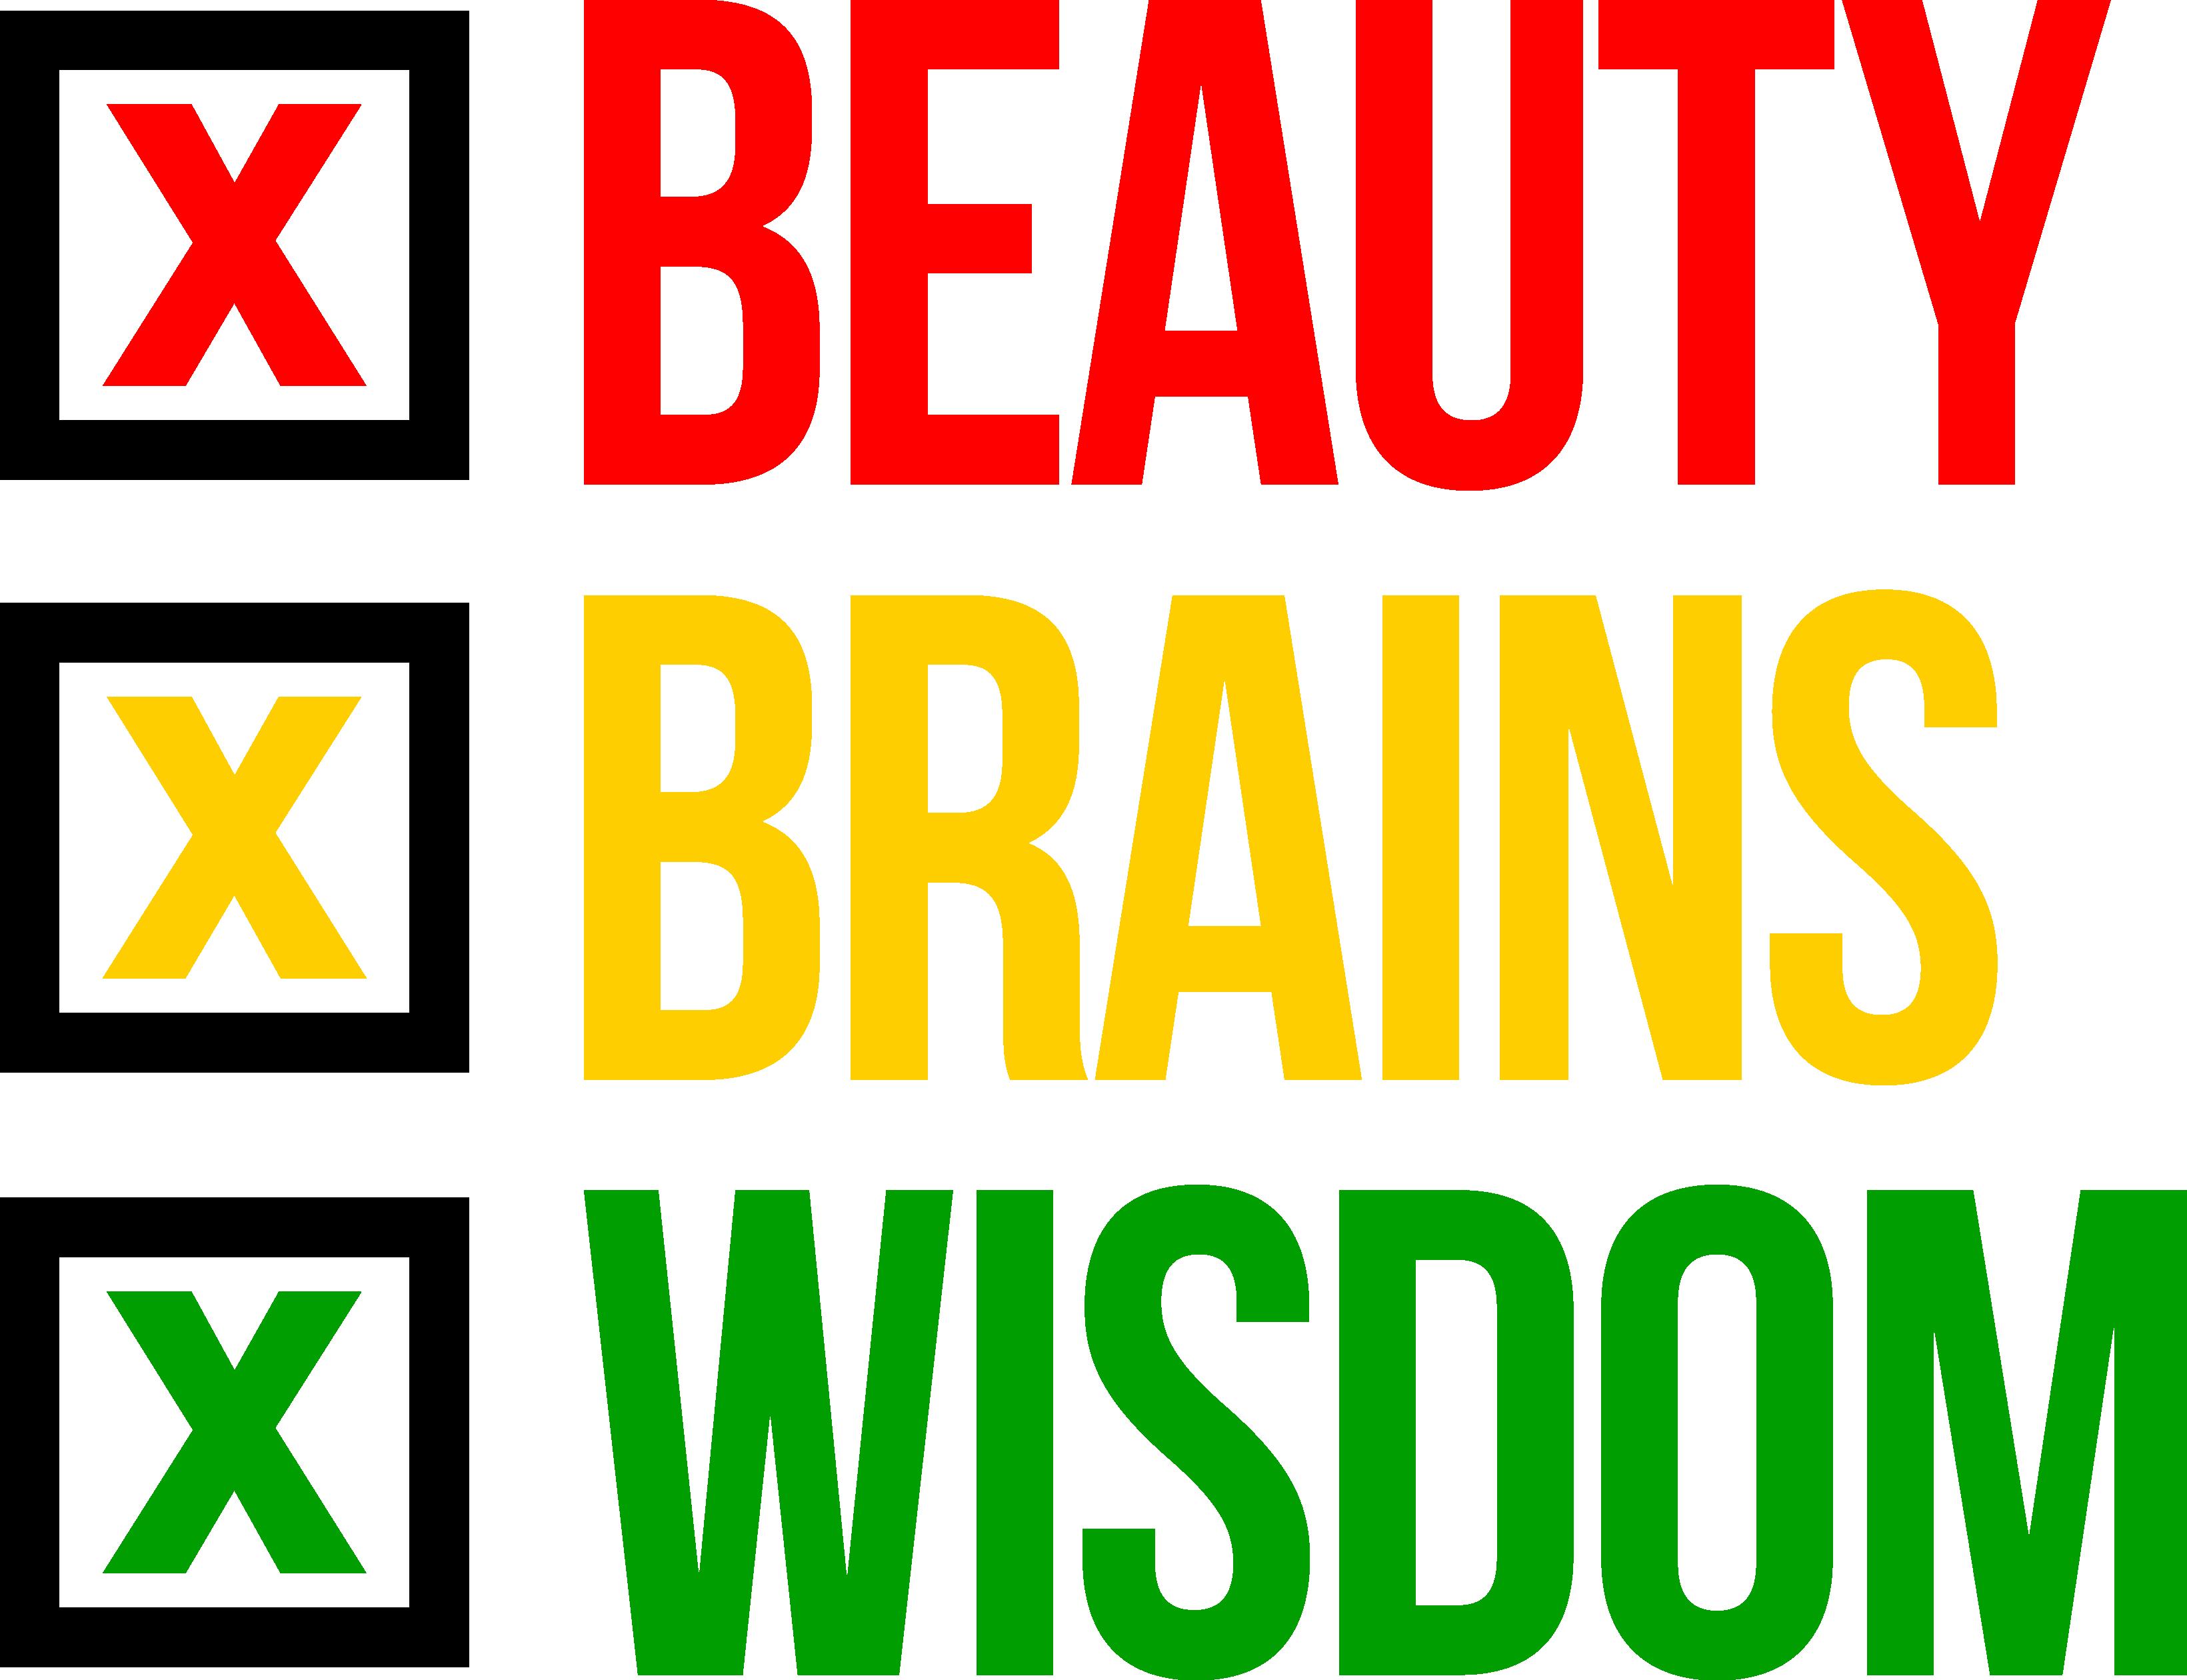 Beautybrainswisdom